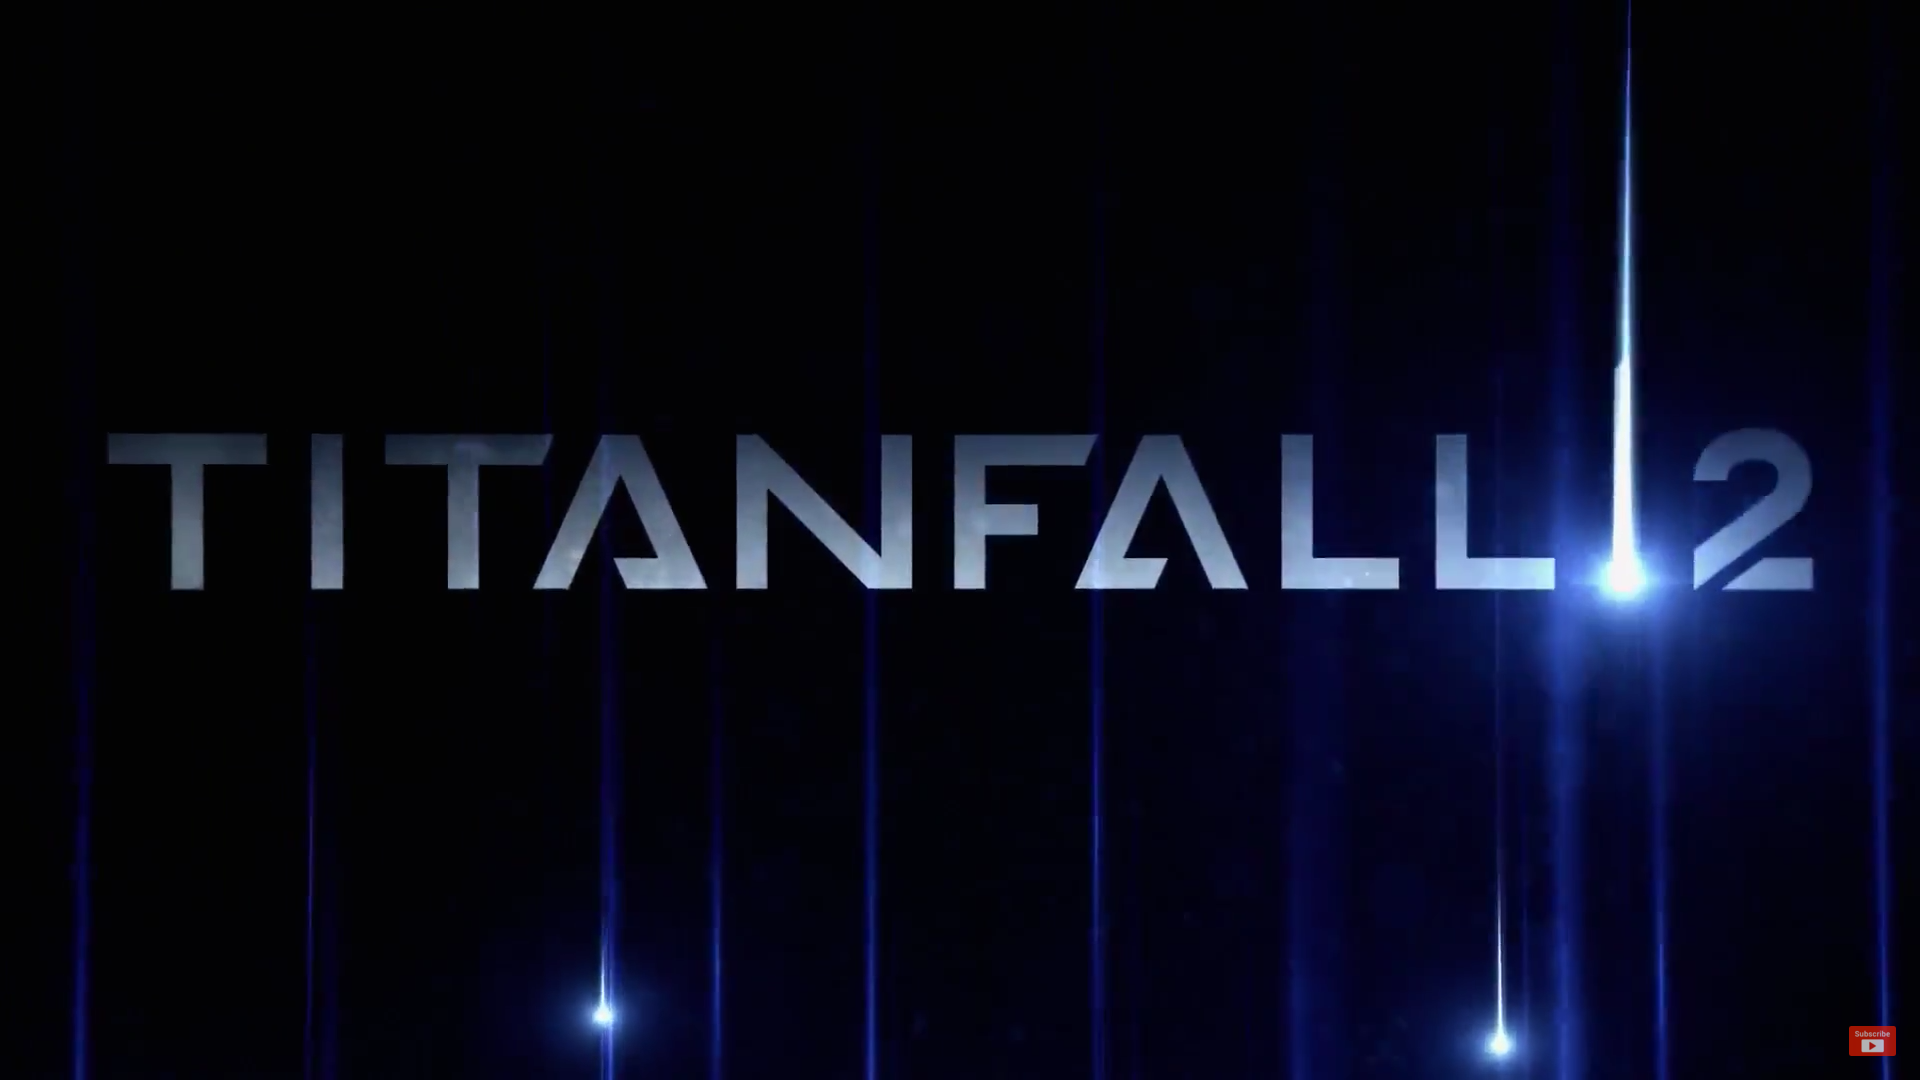 Titanfall 2 Computer Wallpaper